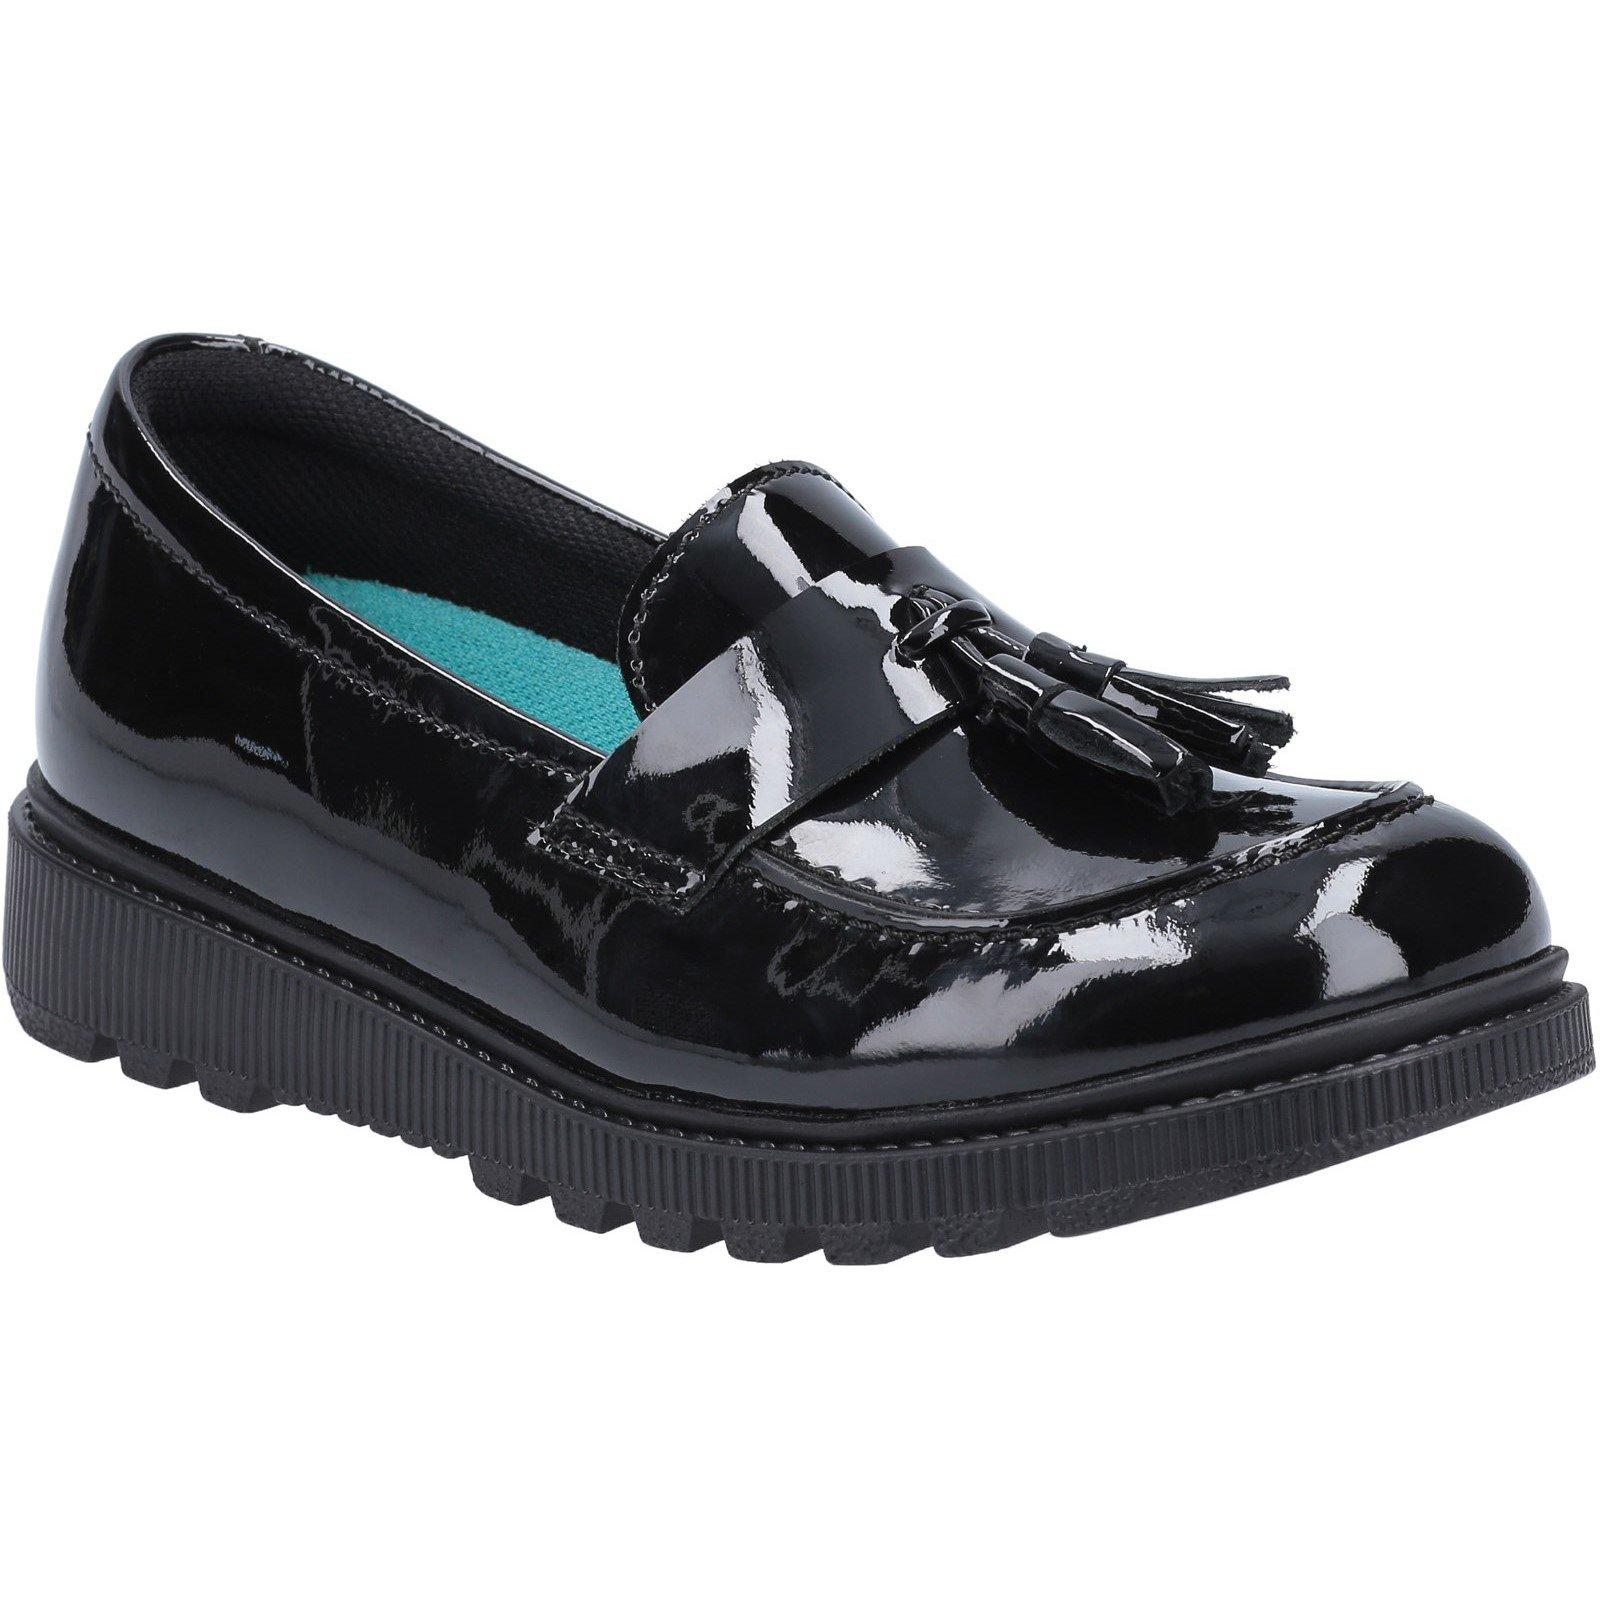 Hush Puppies Kid's Karen Senior School Shoe Patent Black 30828 - Patent Black 3